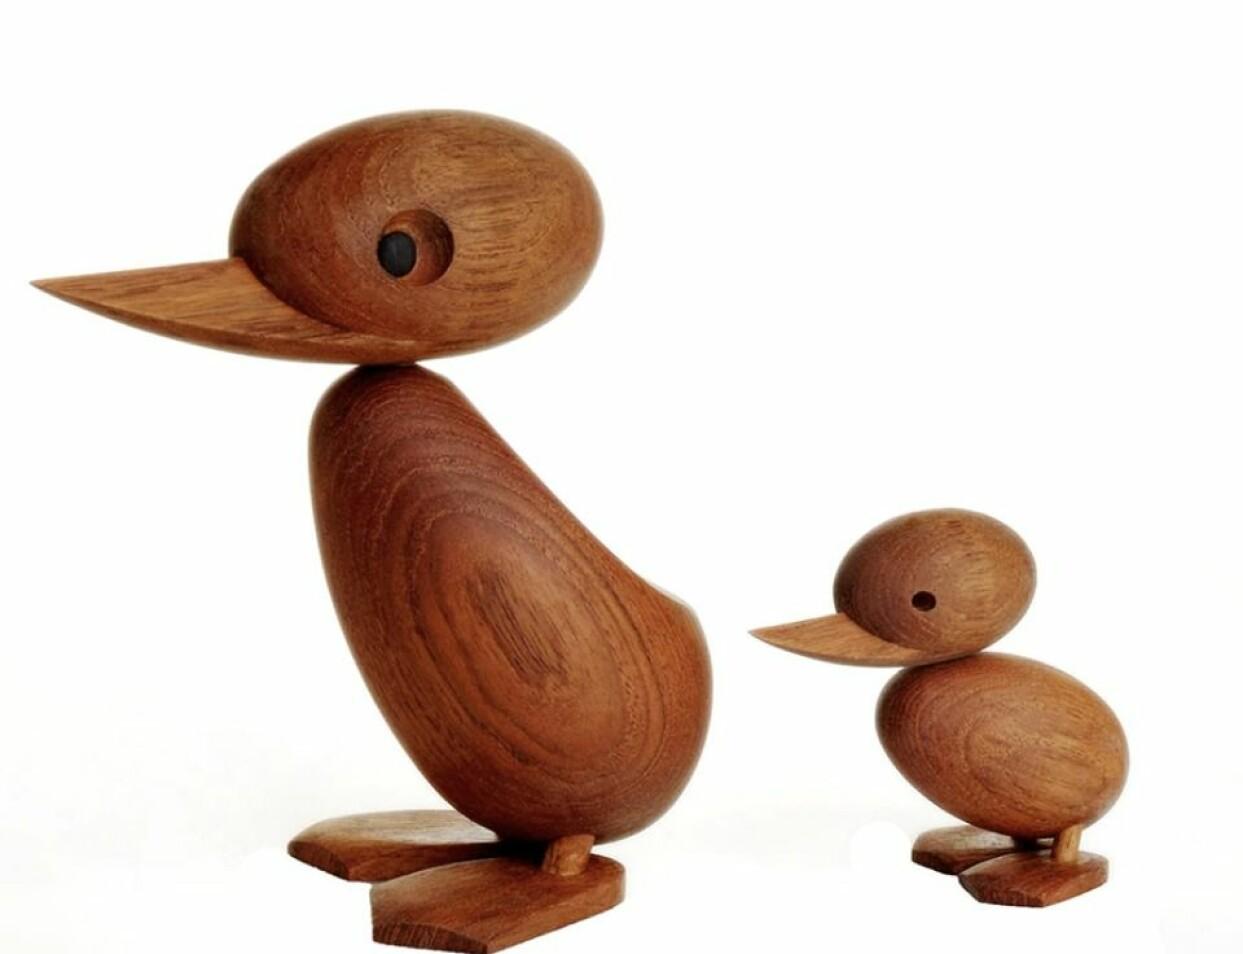 Hans Bøllings duck and duckling